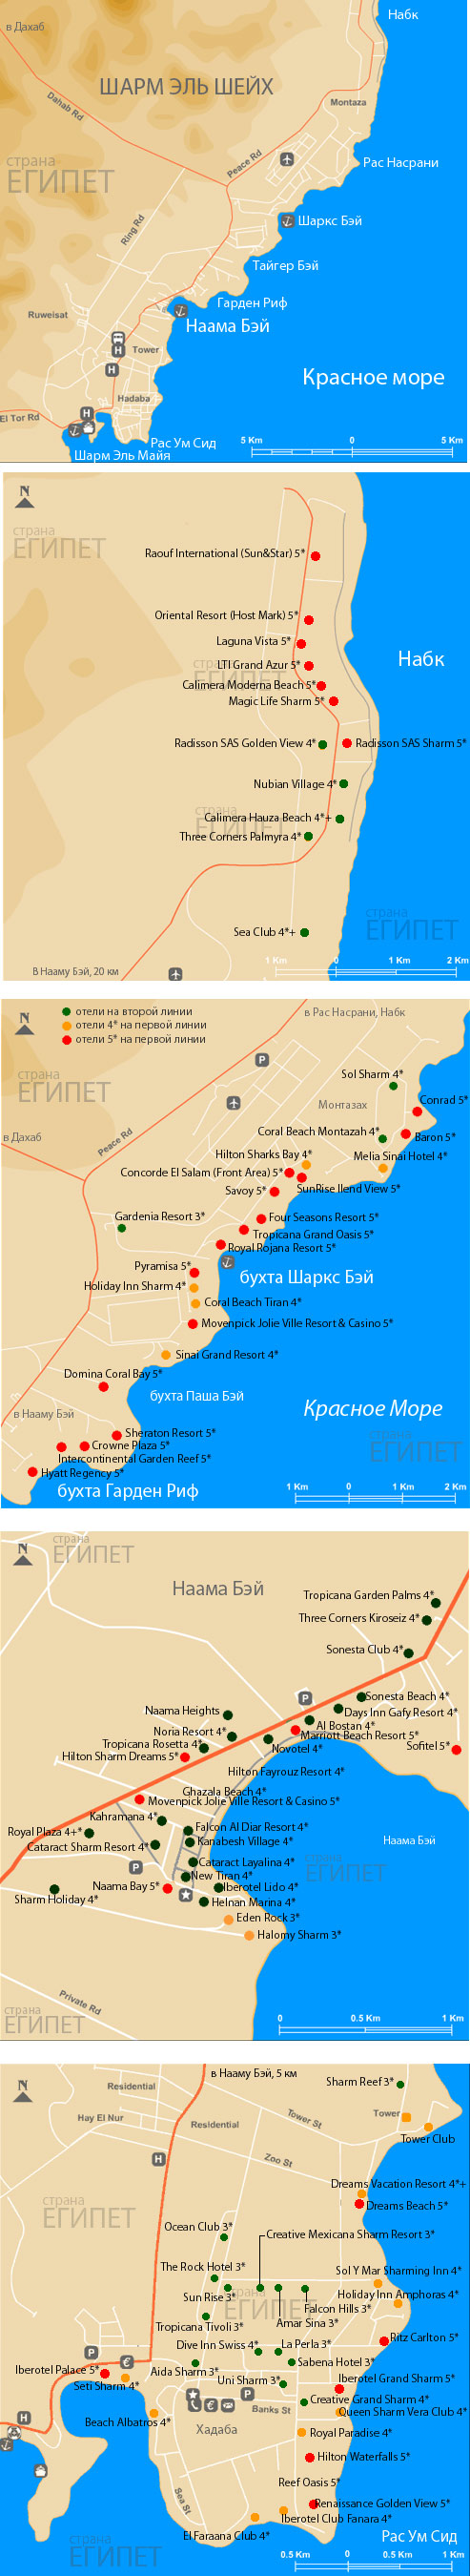 Карта отелей шарм эль шейха от мансаны